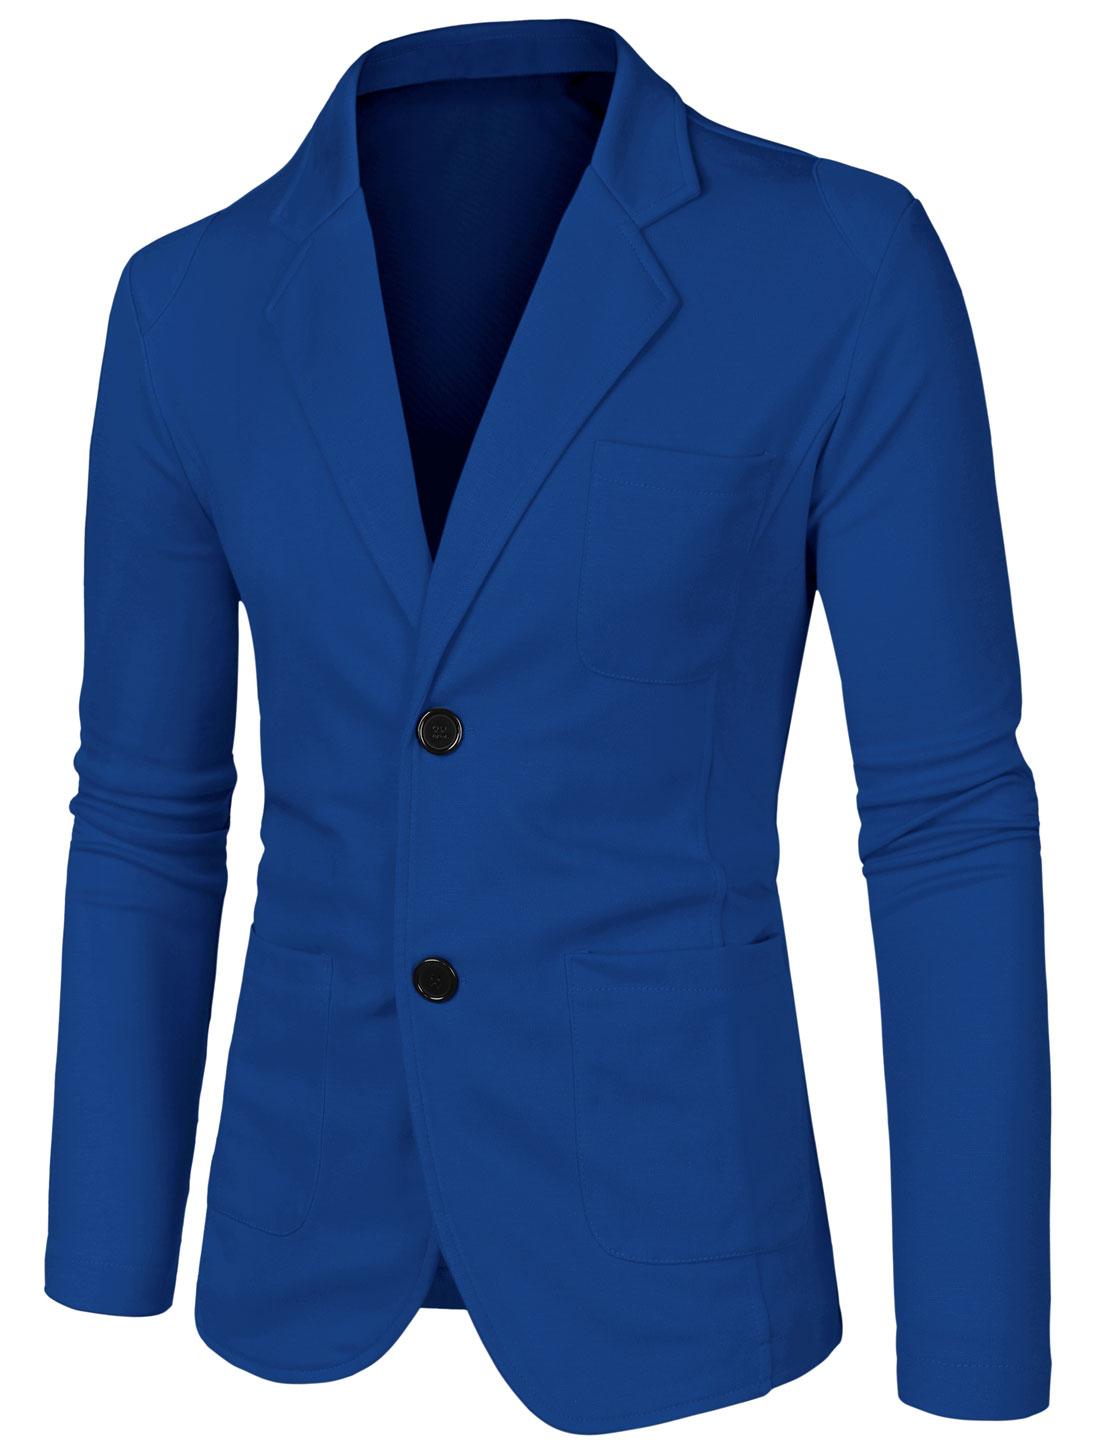 Men Notched Lapel Solid Color Long Sleeve Knit Blazer Blue 42